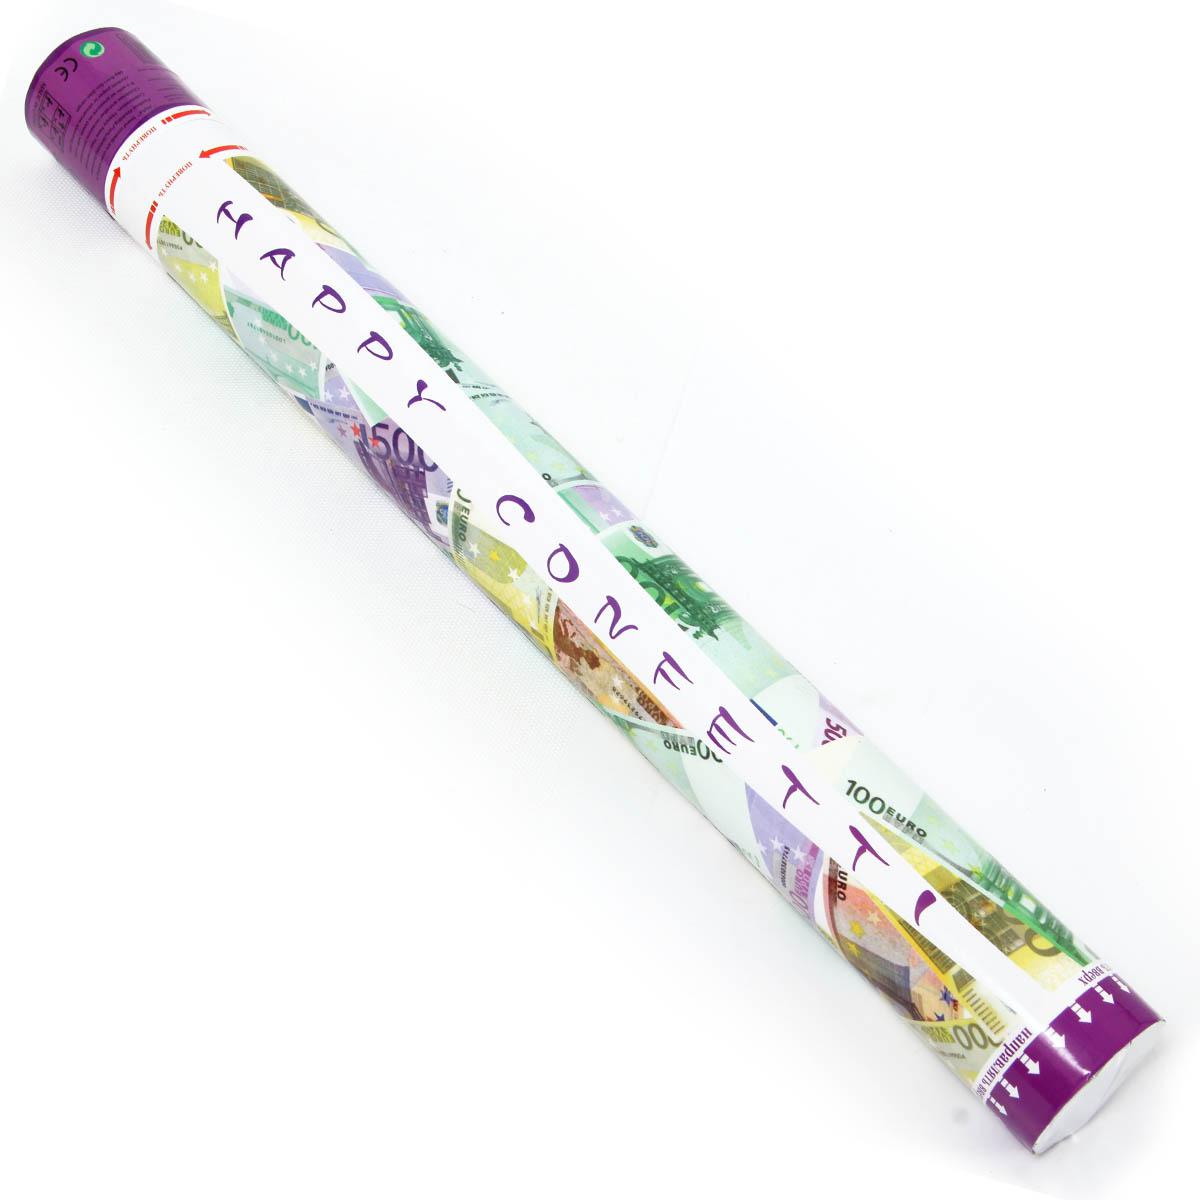 Veld-Co Хлопушка-конфетти механическая 50 см 43457 -  Хлопушки бумфети